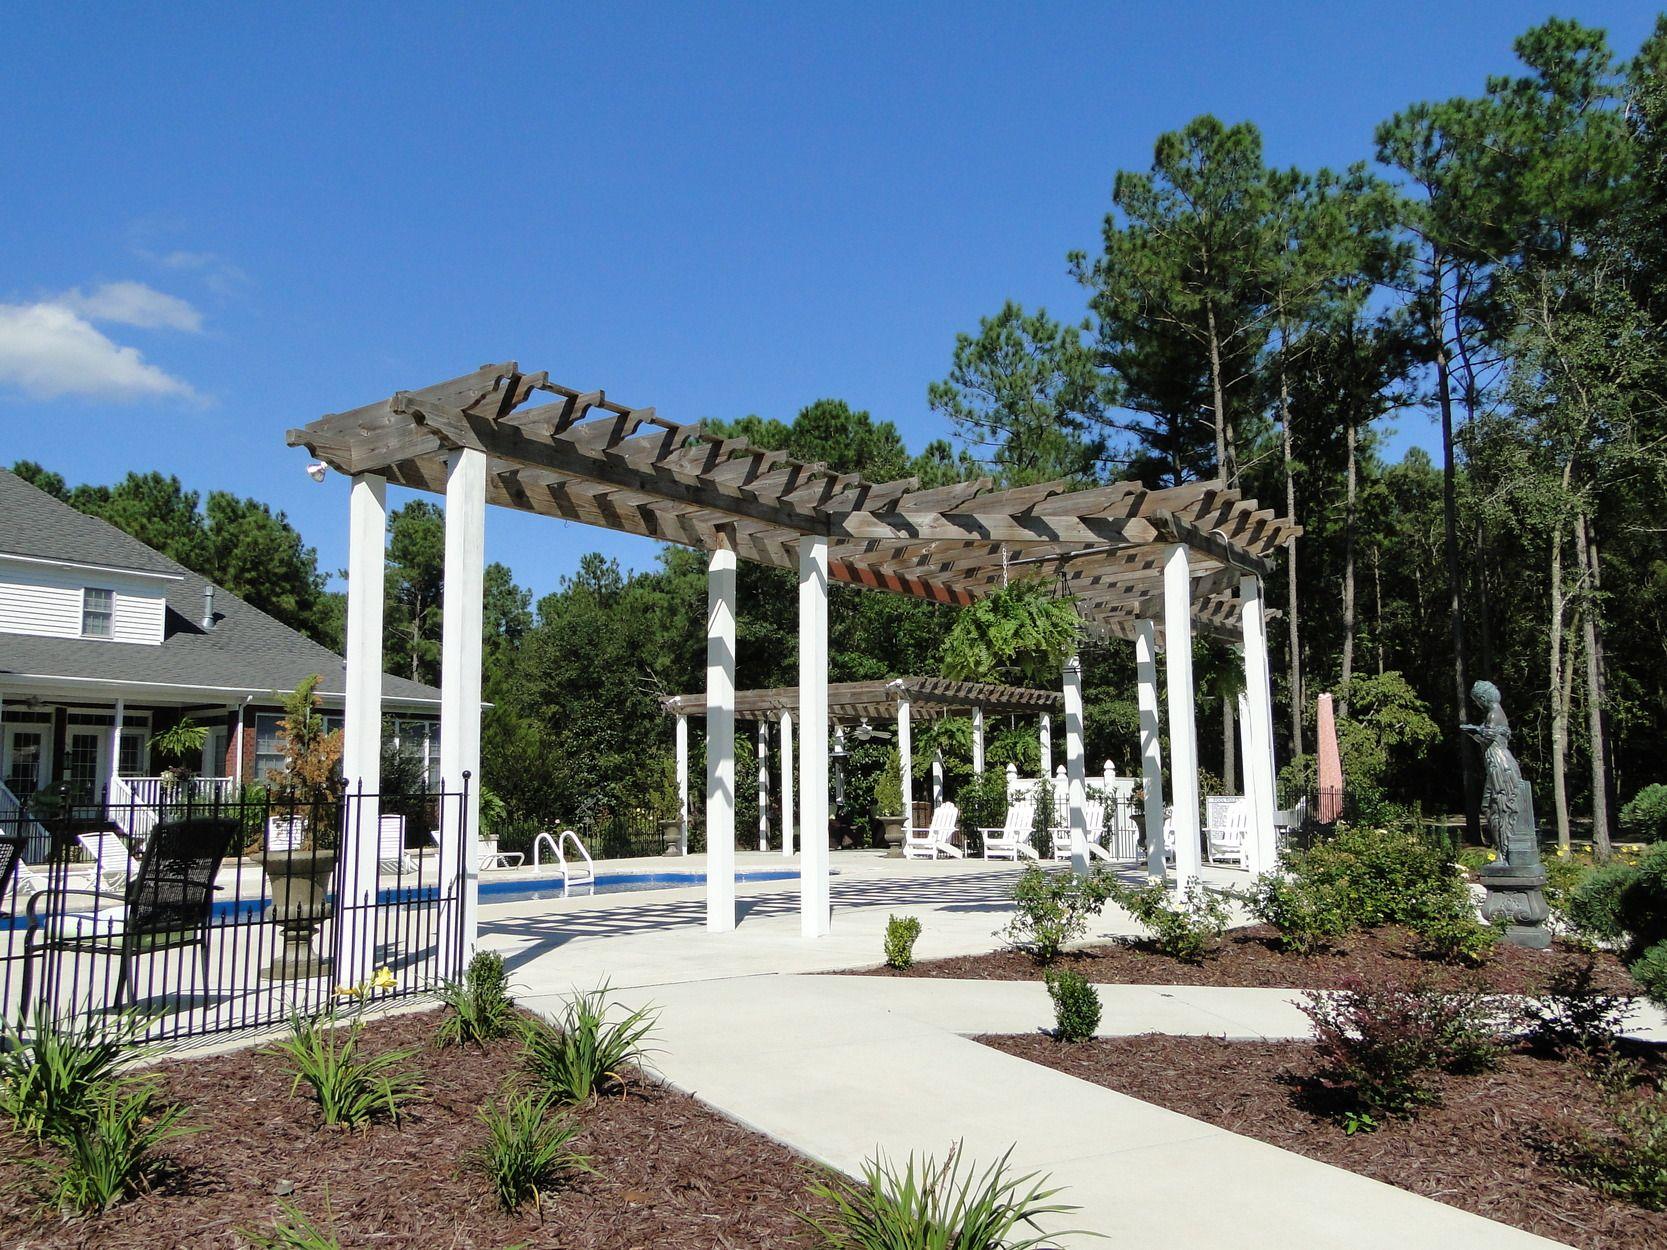 Outdoor wedding venue; The perfect southern outdoor venue ...